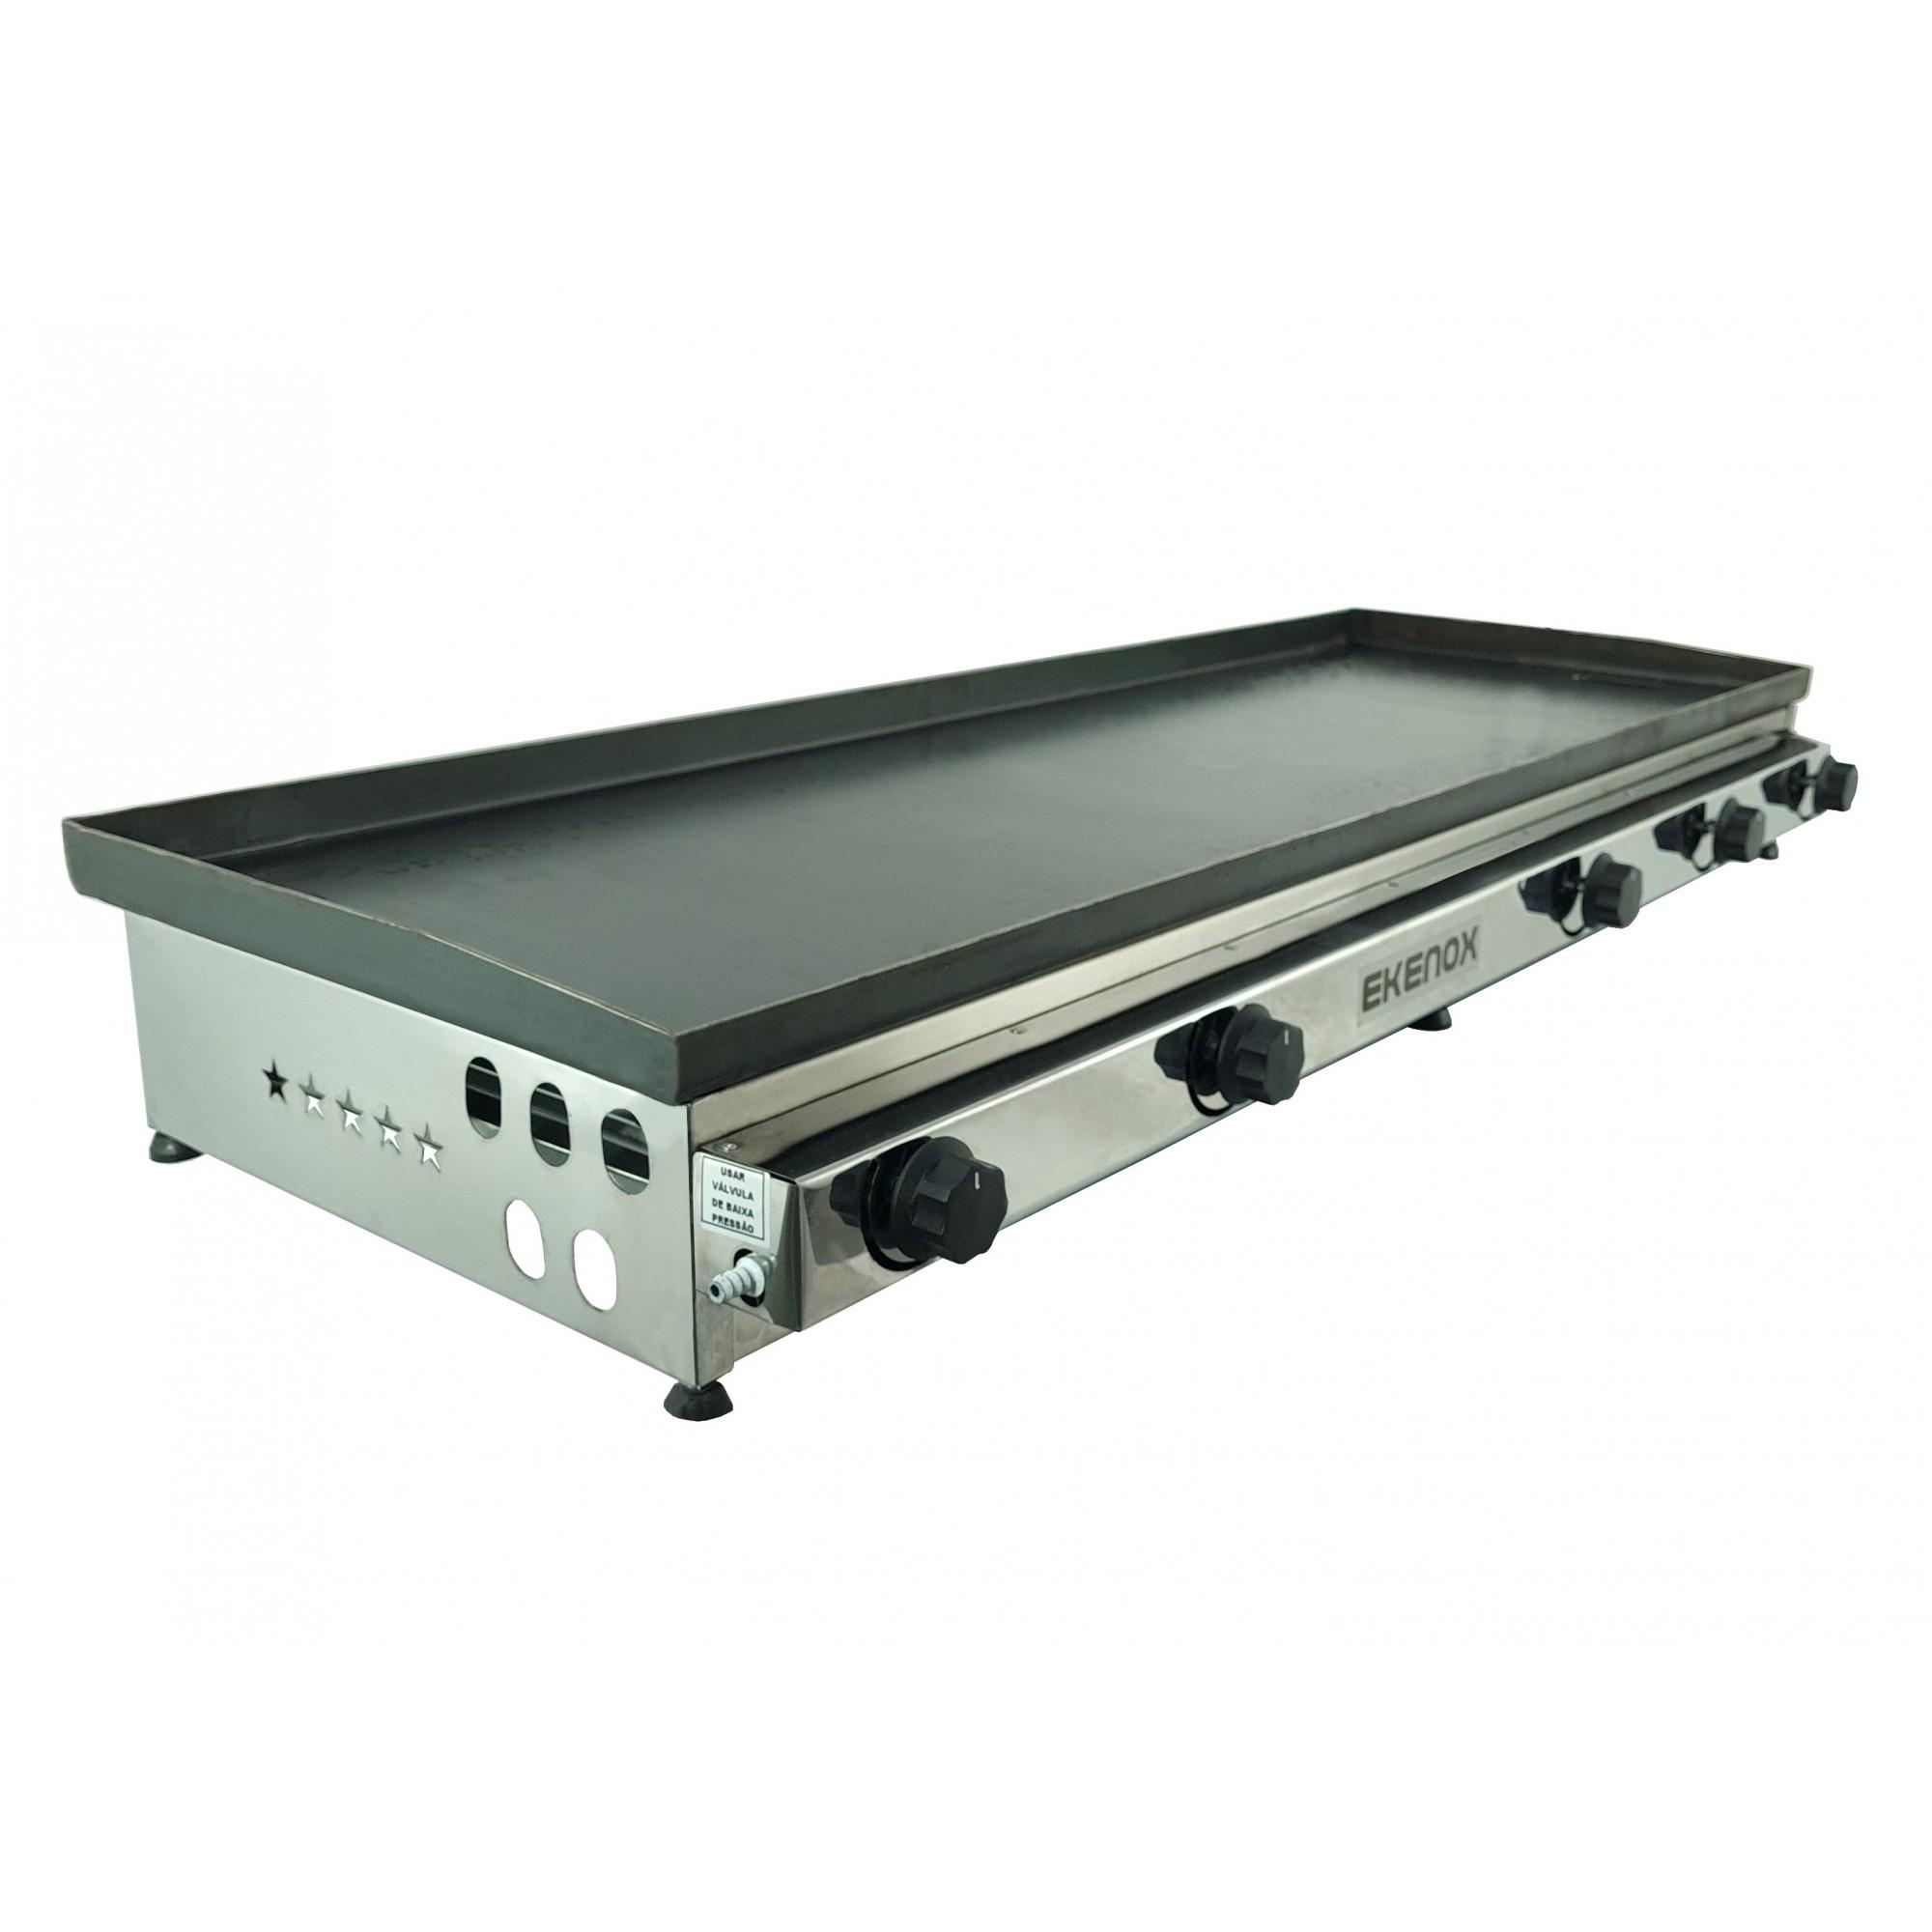 Chapa Para Lanches 130x50 Cm Ekenox 5 Queimadores  - EKENOX- Equipamentos Industriais